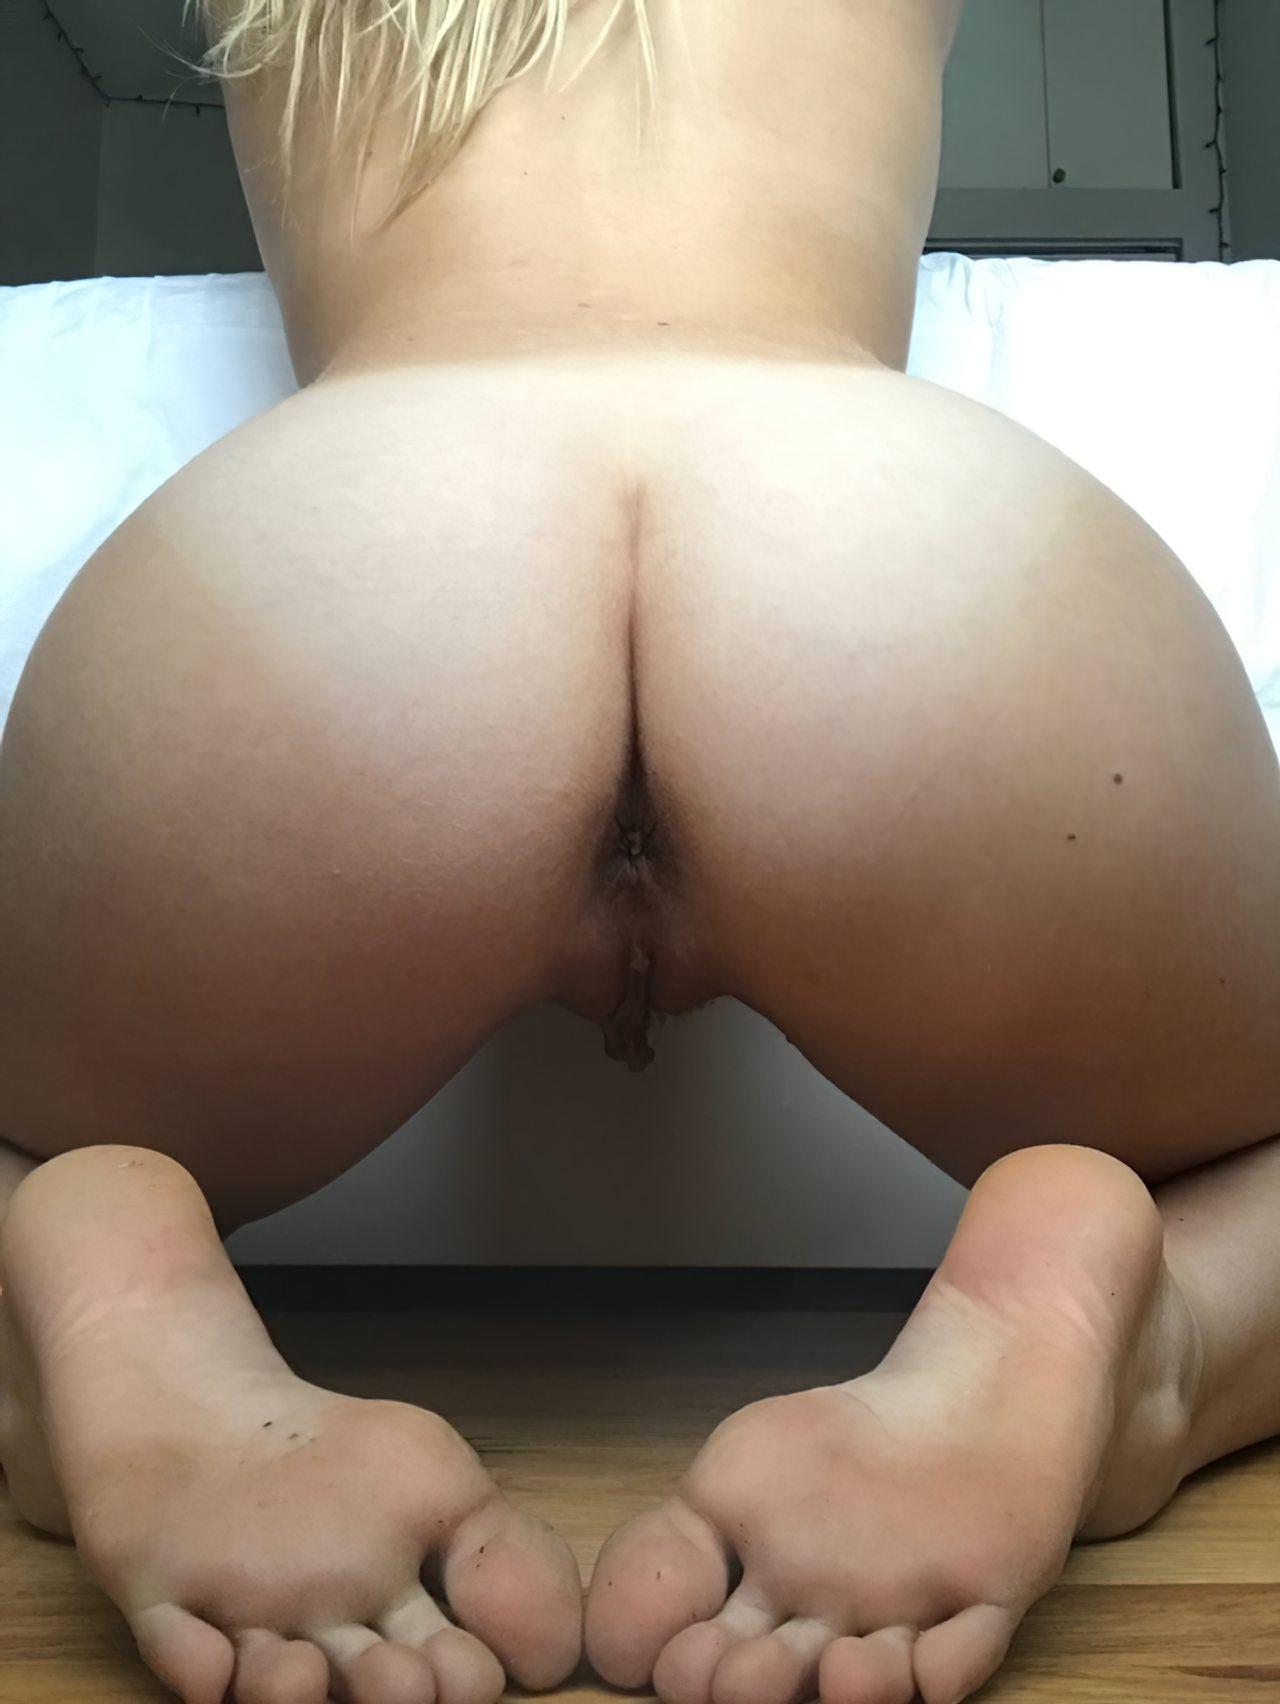 Mulheres (49)